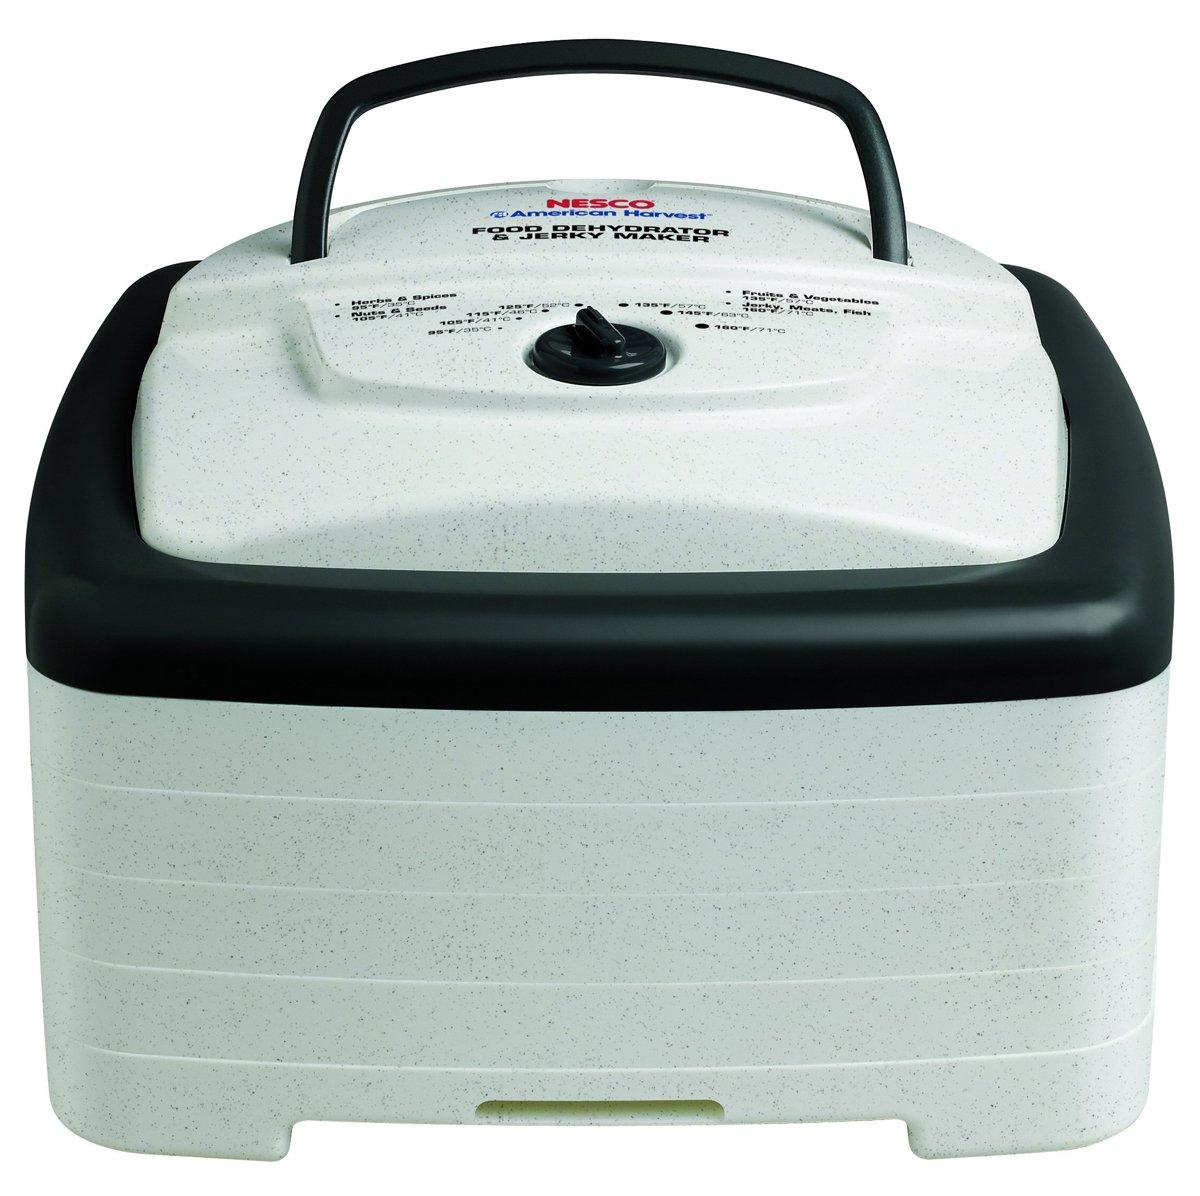 Nesco FD-80 700W Color blanco secador de fruta - Deshidratador de fruta (700 W): Amazon.es: Hogar